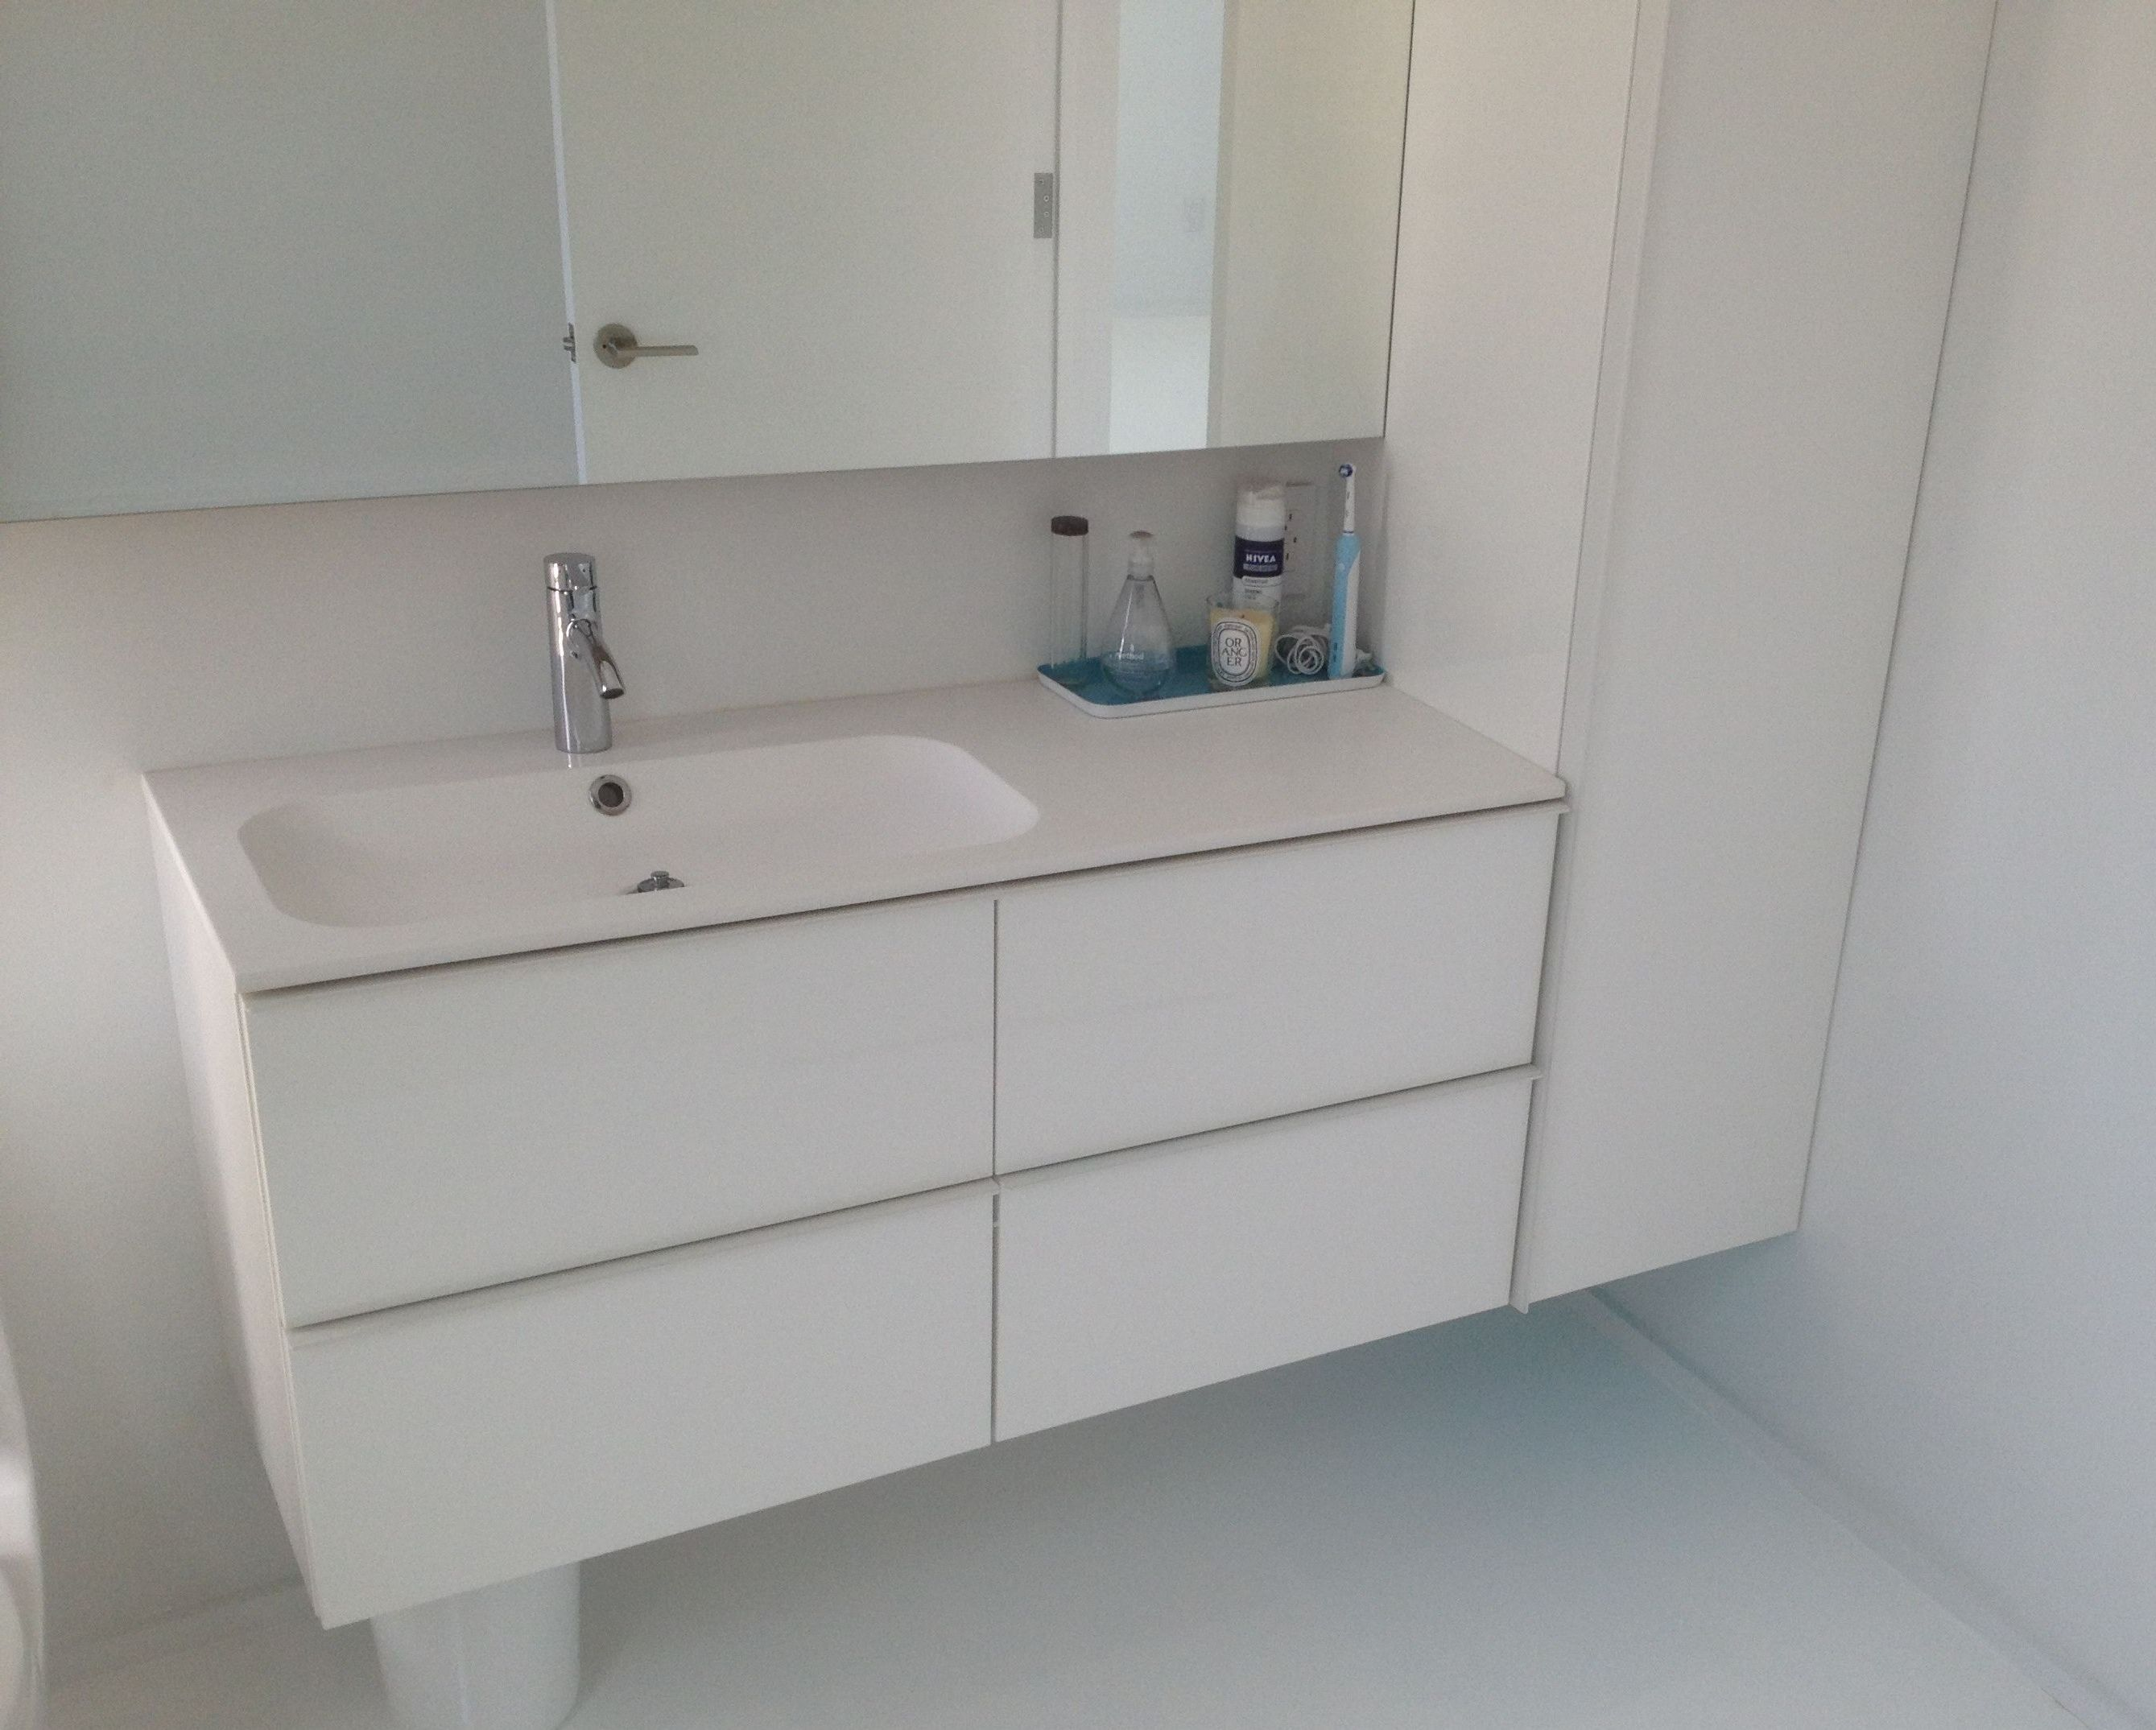 Ikea Badezimmer Waschbecken Schrank Ikea Badezimmer Waschbecken Schrank Fur Die Mobel In Ihrem Haus Die Ikea Badezimmer Badezimmer Waschbecken Badezimmer